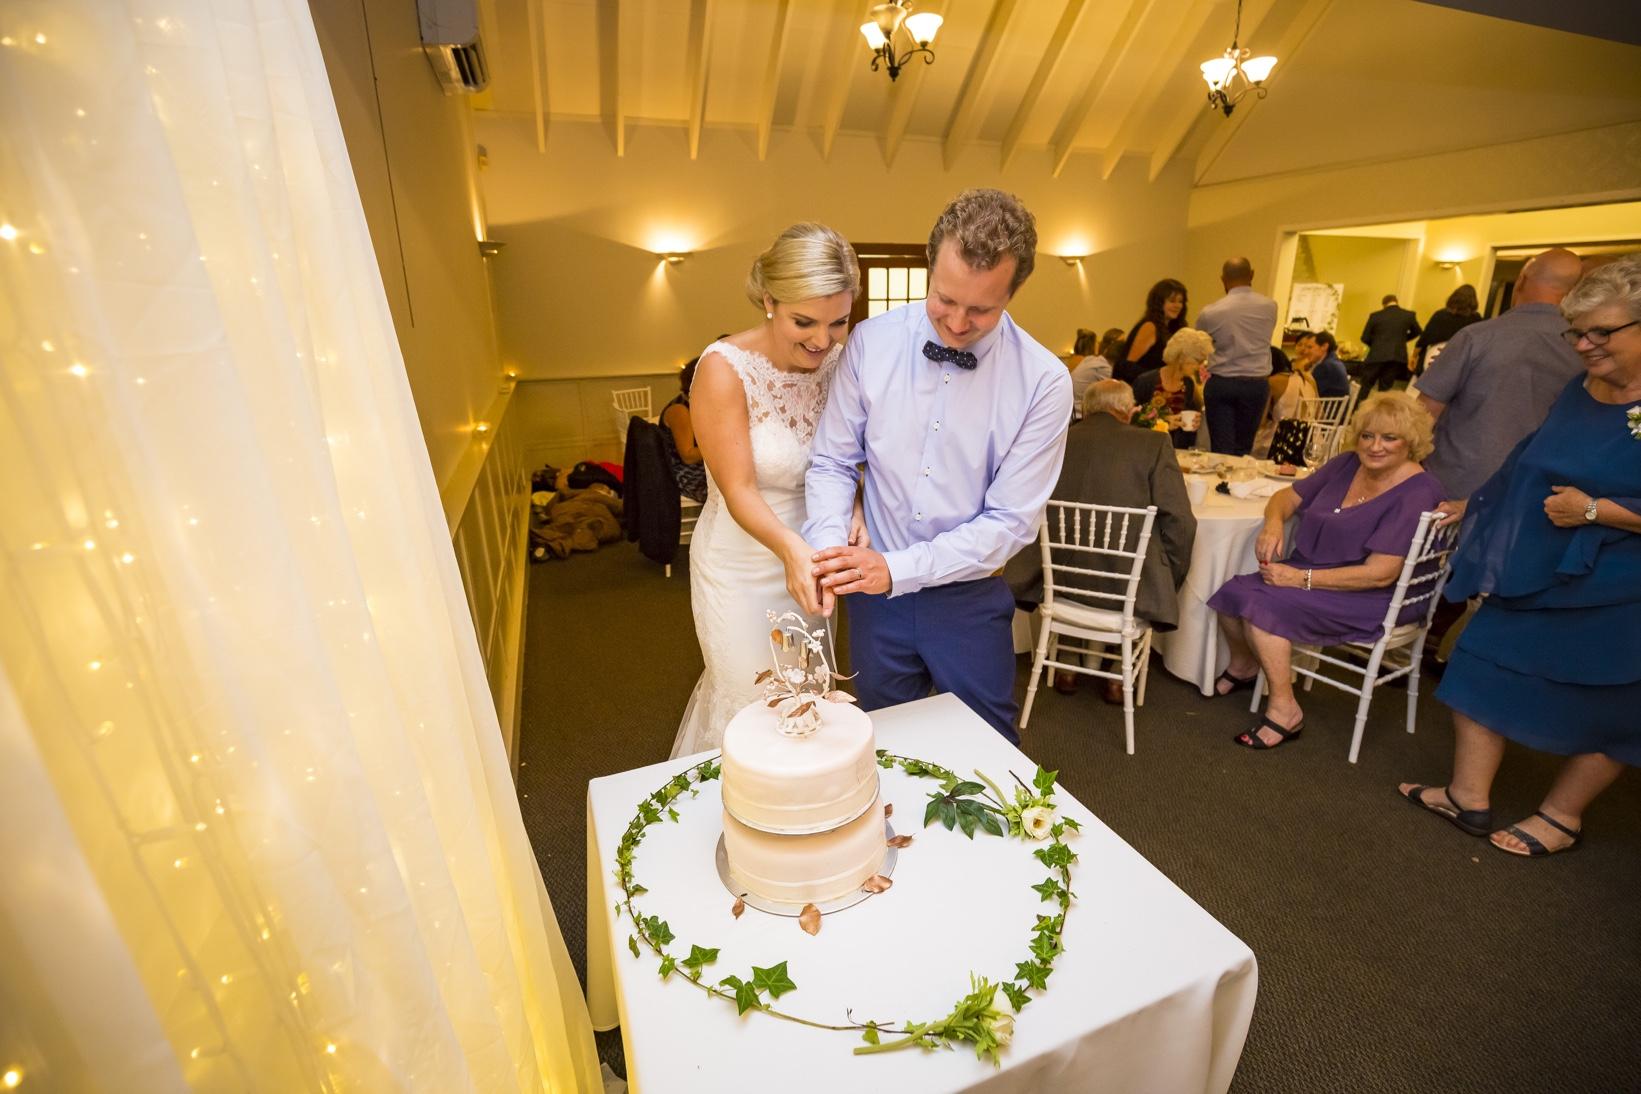 Cake cutting Bride & Groom Auckland